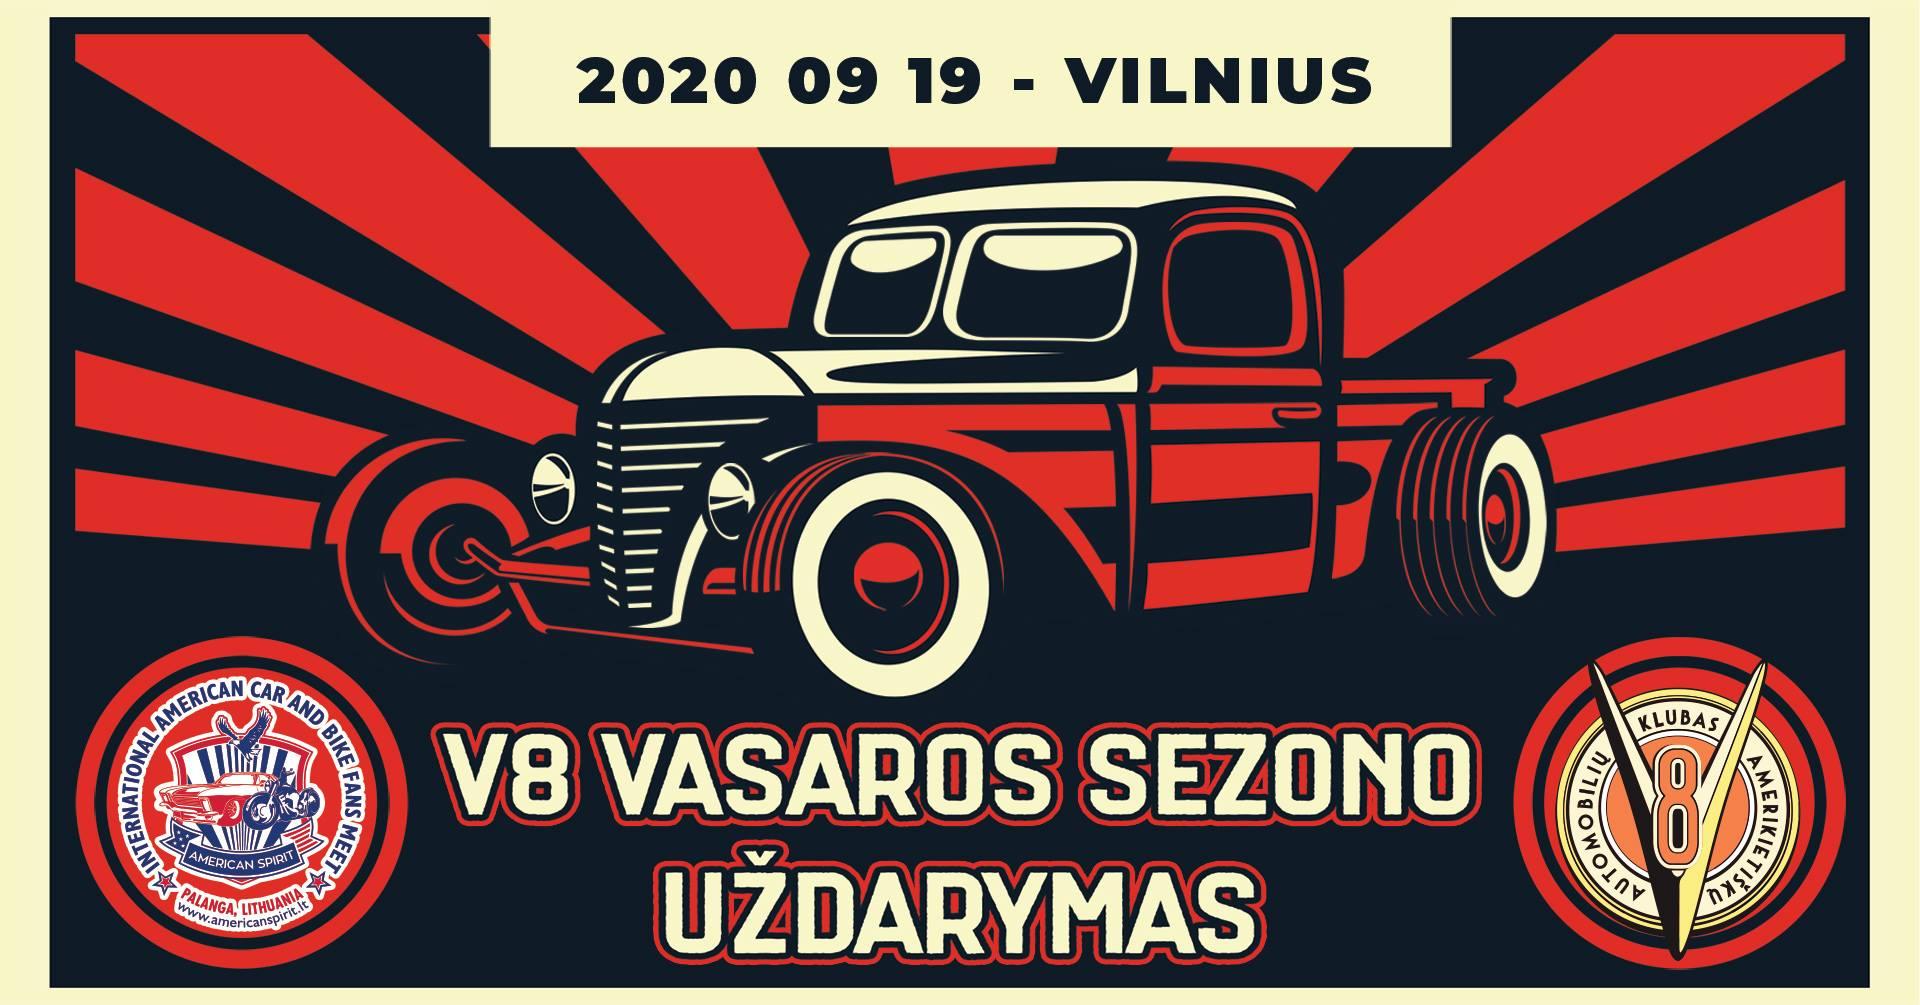 V8 sezono uždarymas